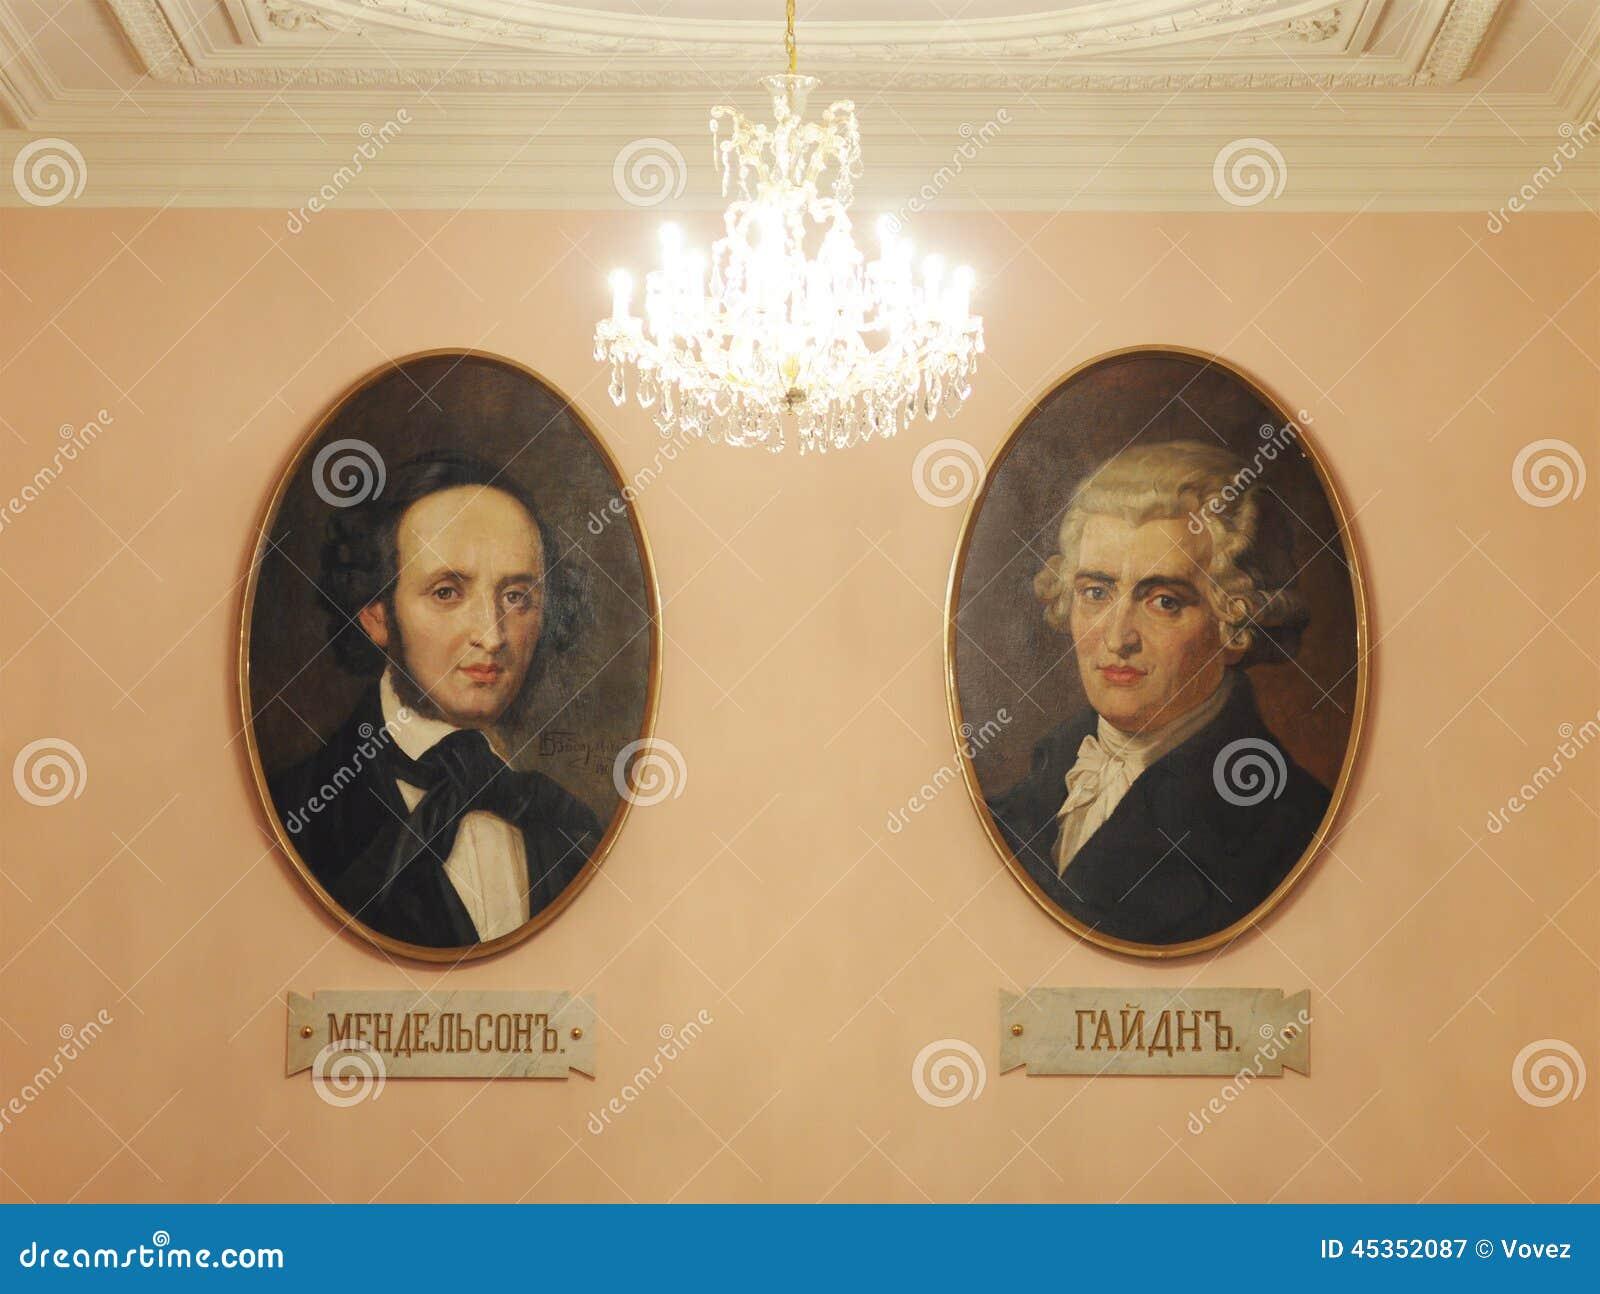 Portraits de Haydn et de Mendelssohn, conservatoire de Moscou